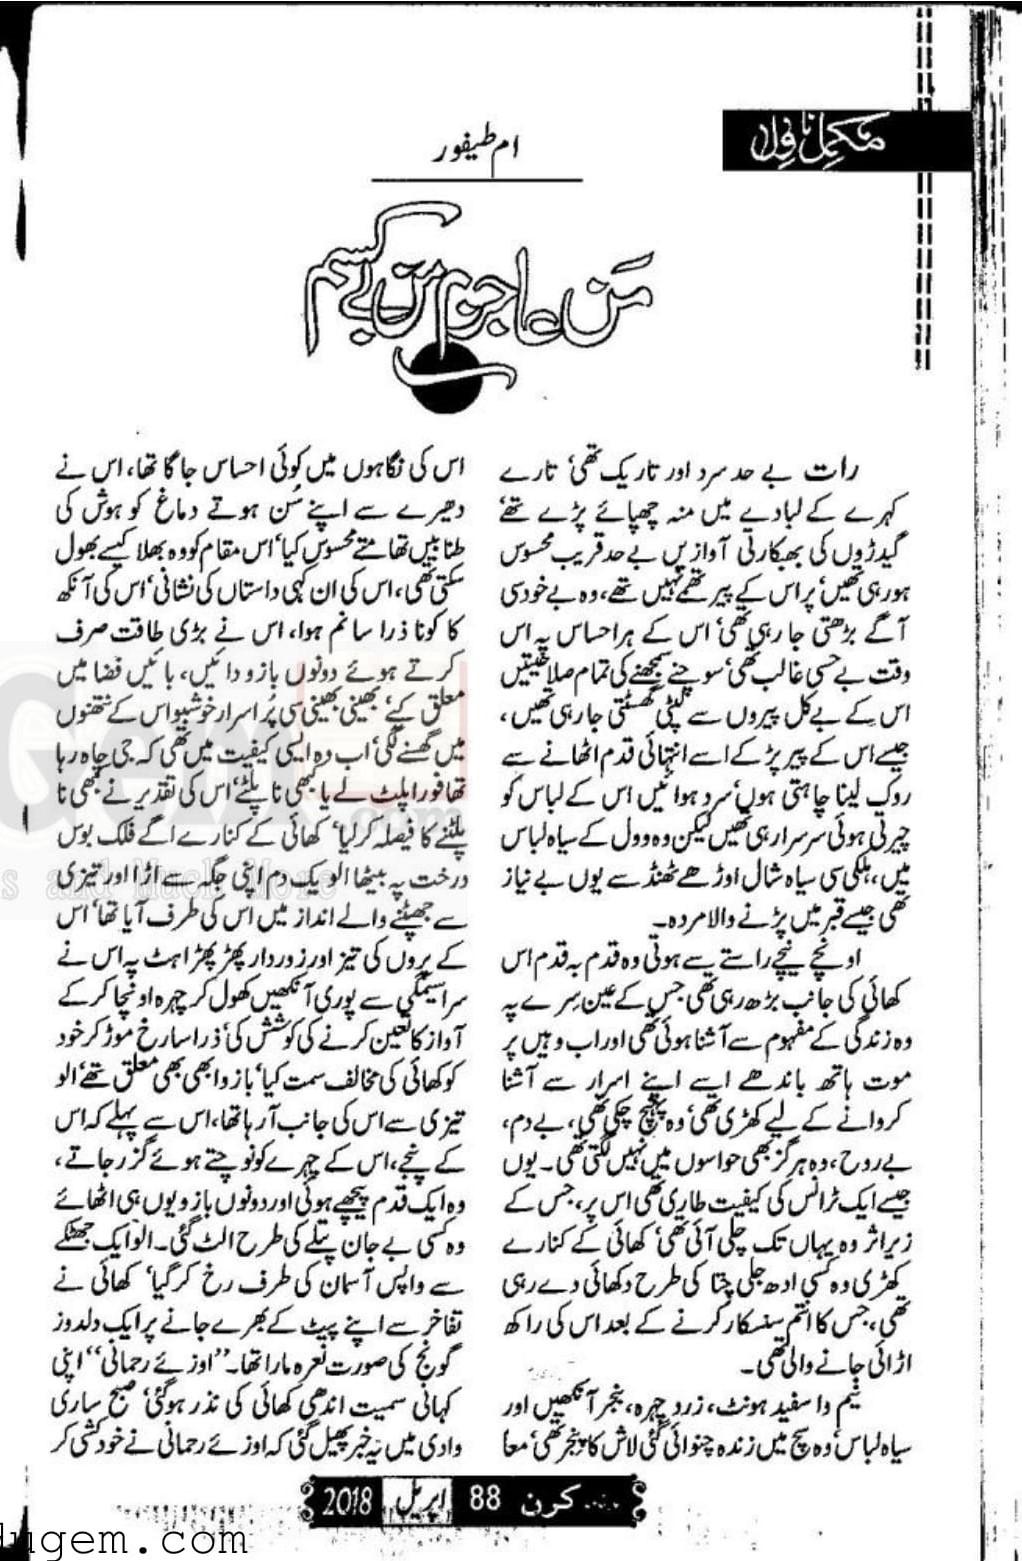 ezreadings: Maan Ajzam Man Be Kasam by Umme Taifoor Pdf